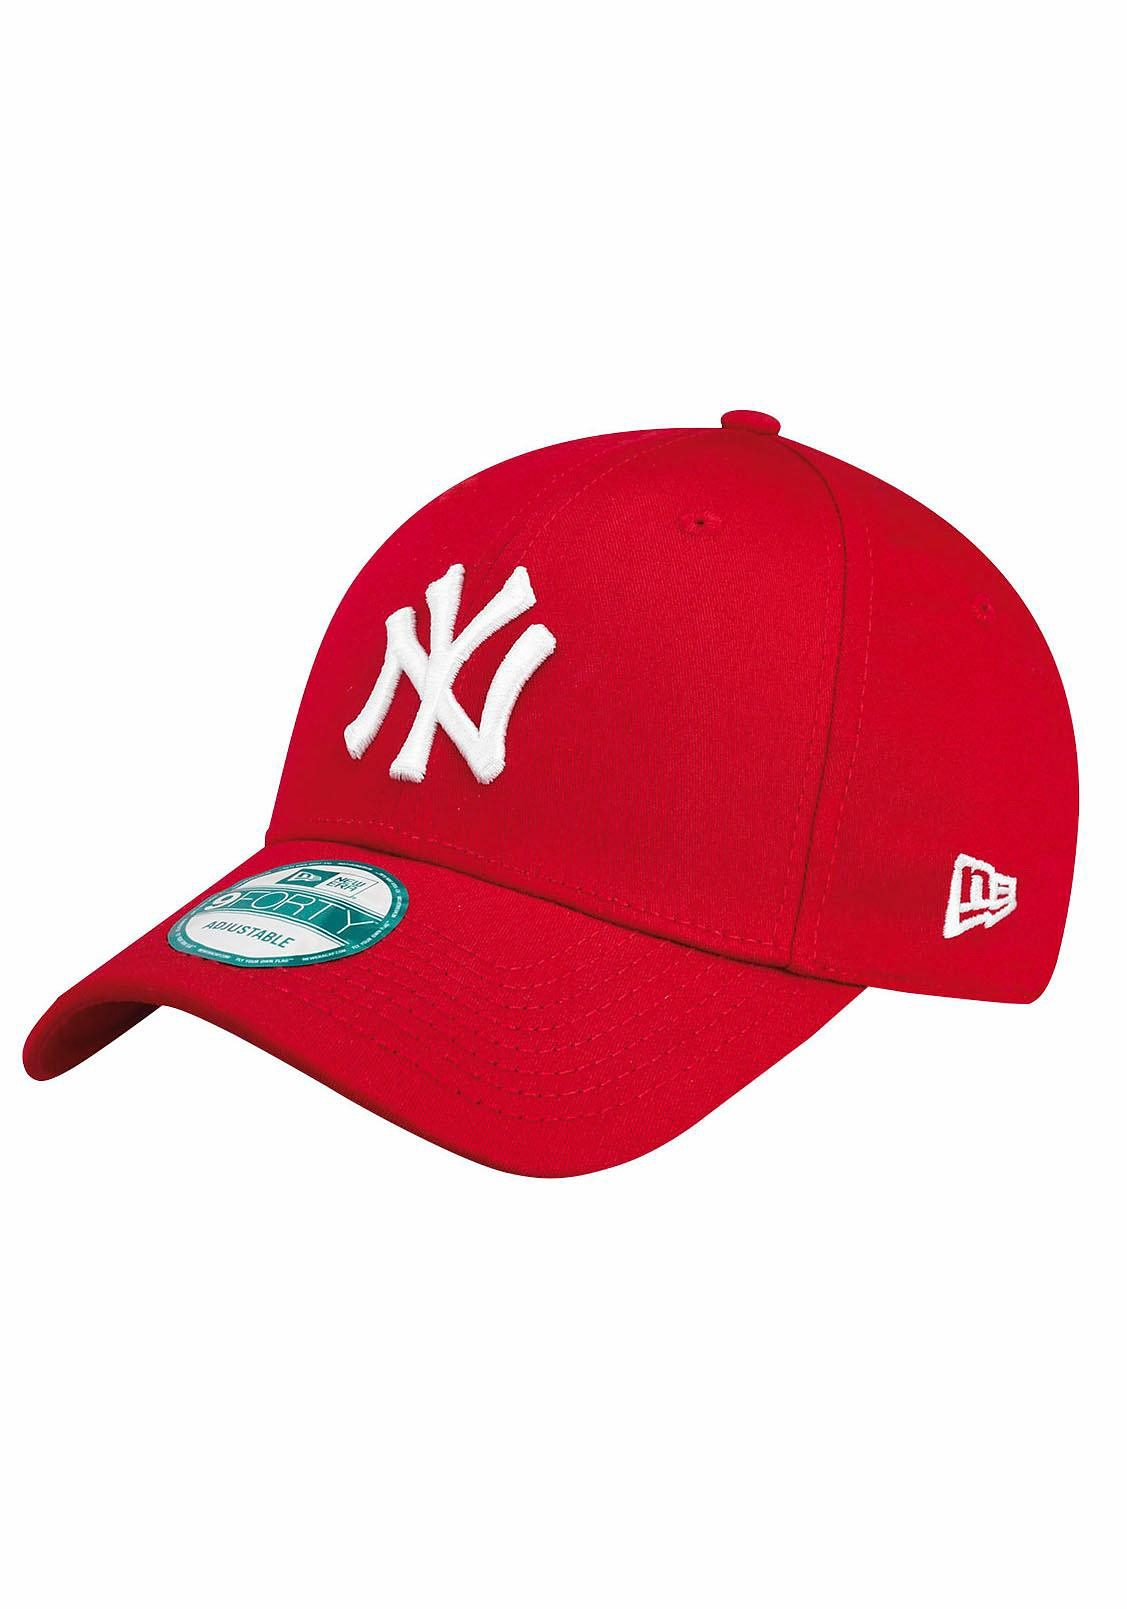 New Era Baseball Cap, 39Thirty, flexfitted, New York Yankees